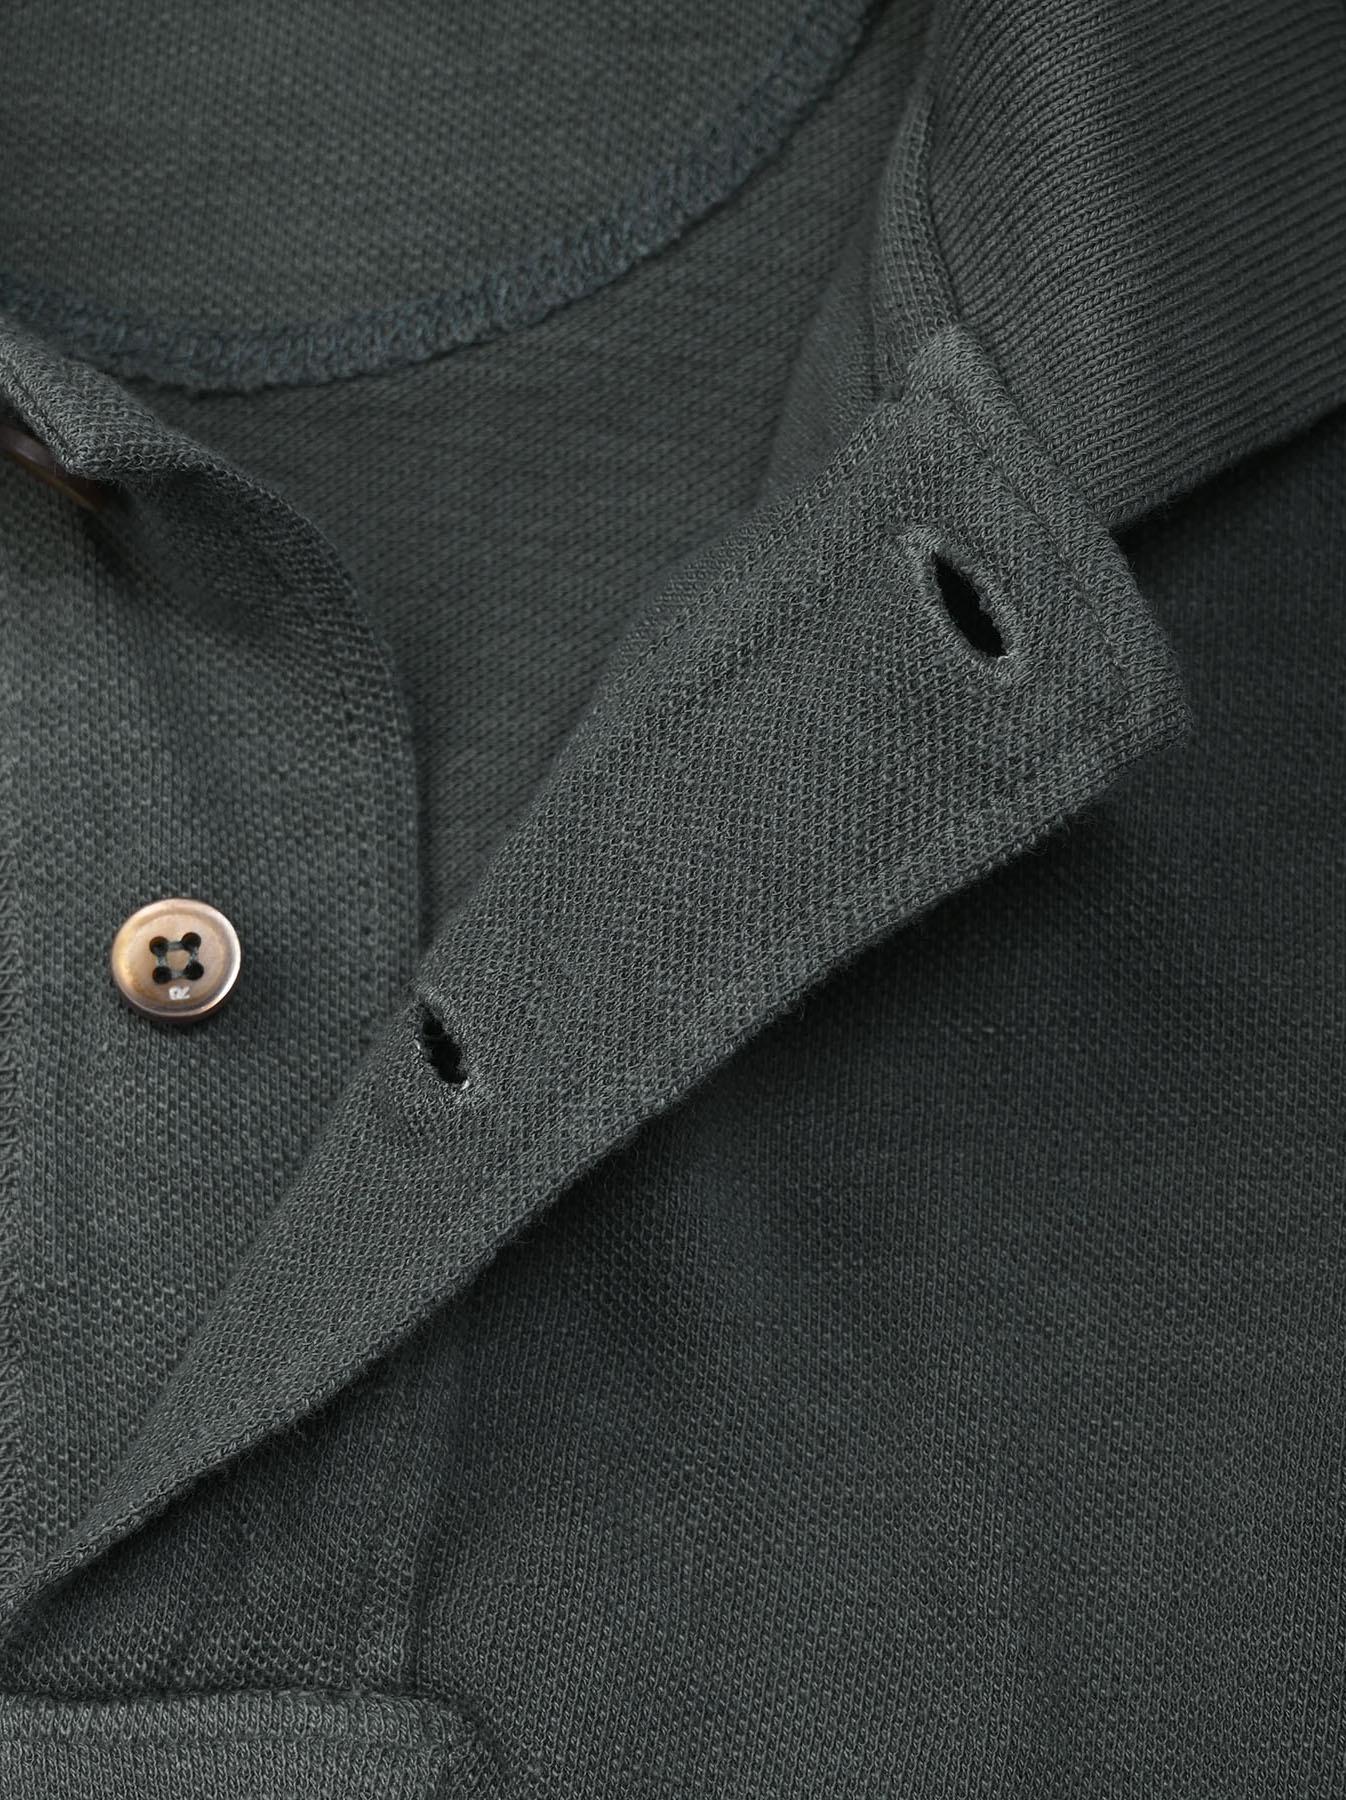 Kanoko Ocean Shiokaze Short-sleeved Polo Dress (0521)-9